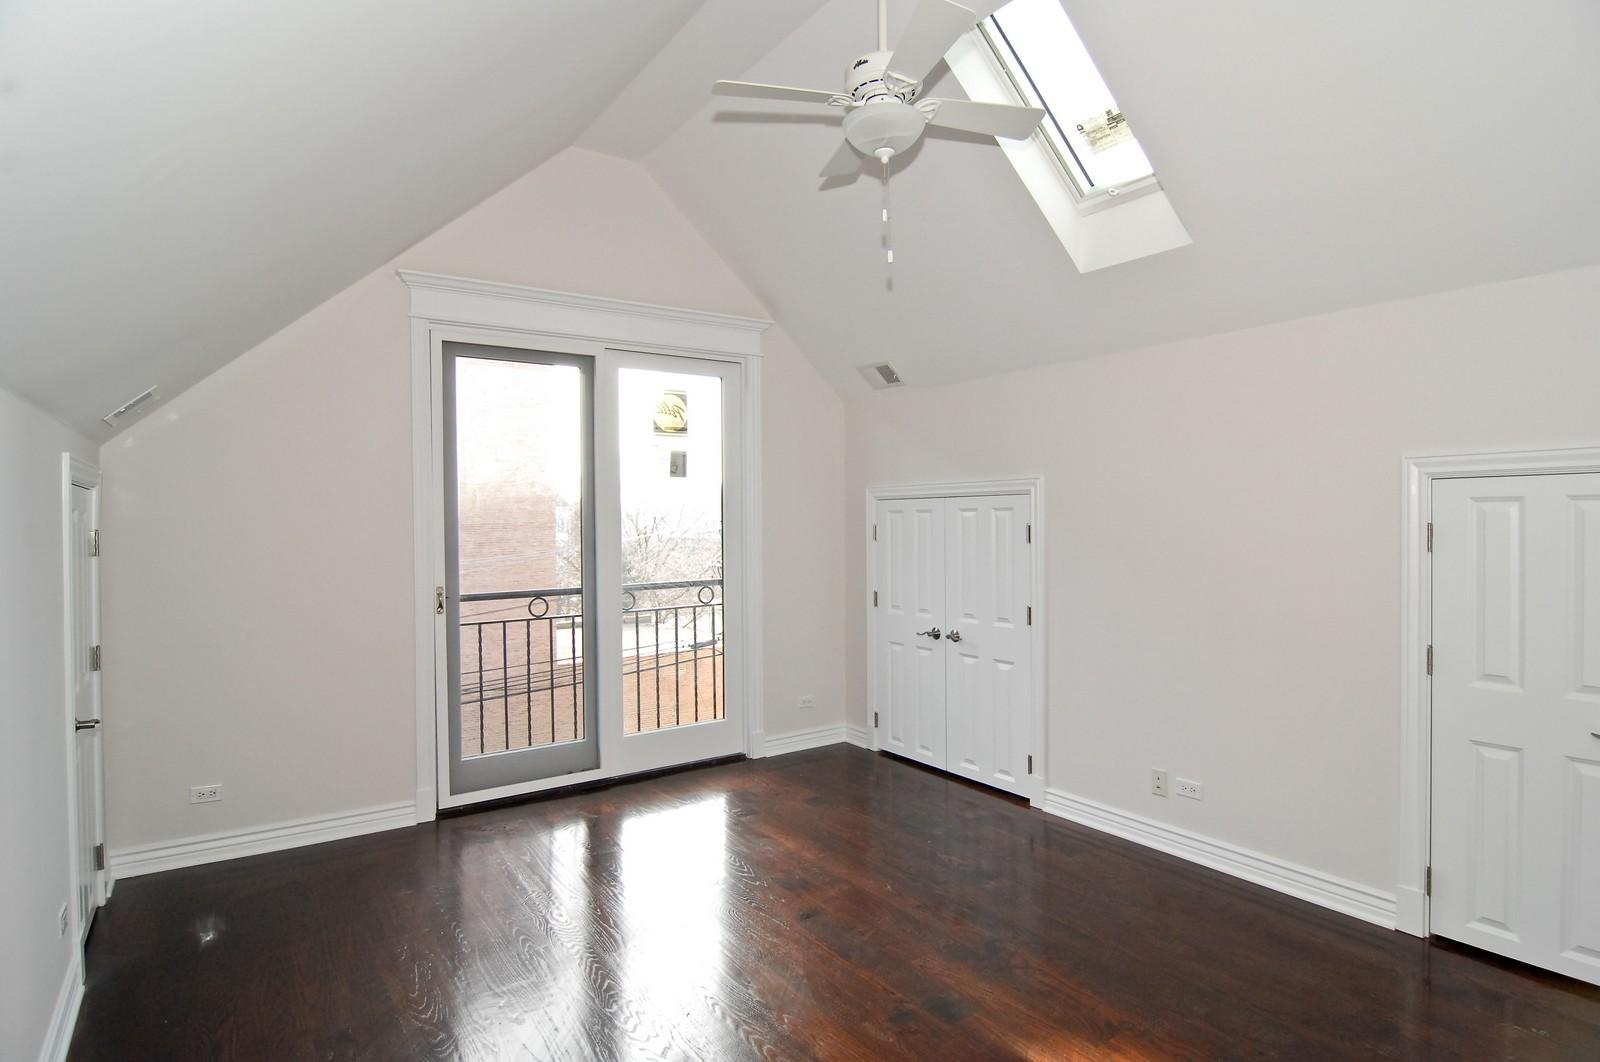 Real Estate Photography - 1845 W. Newport, Chicago, IL, 60657 - Location 2